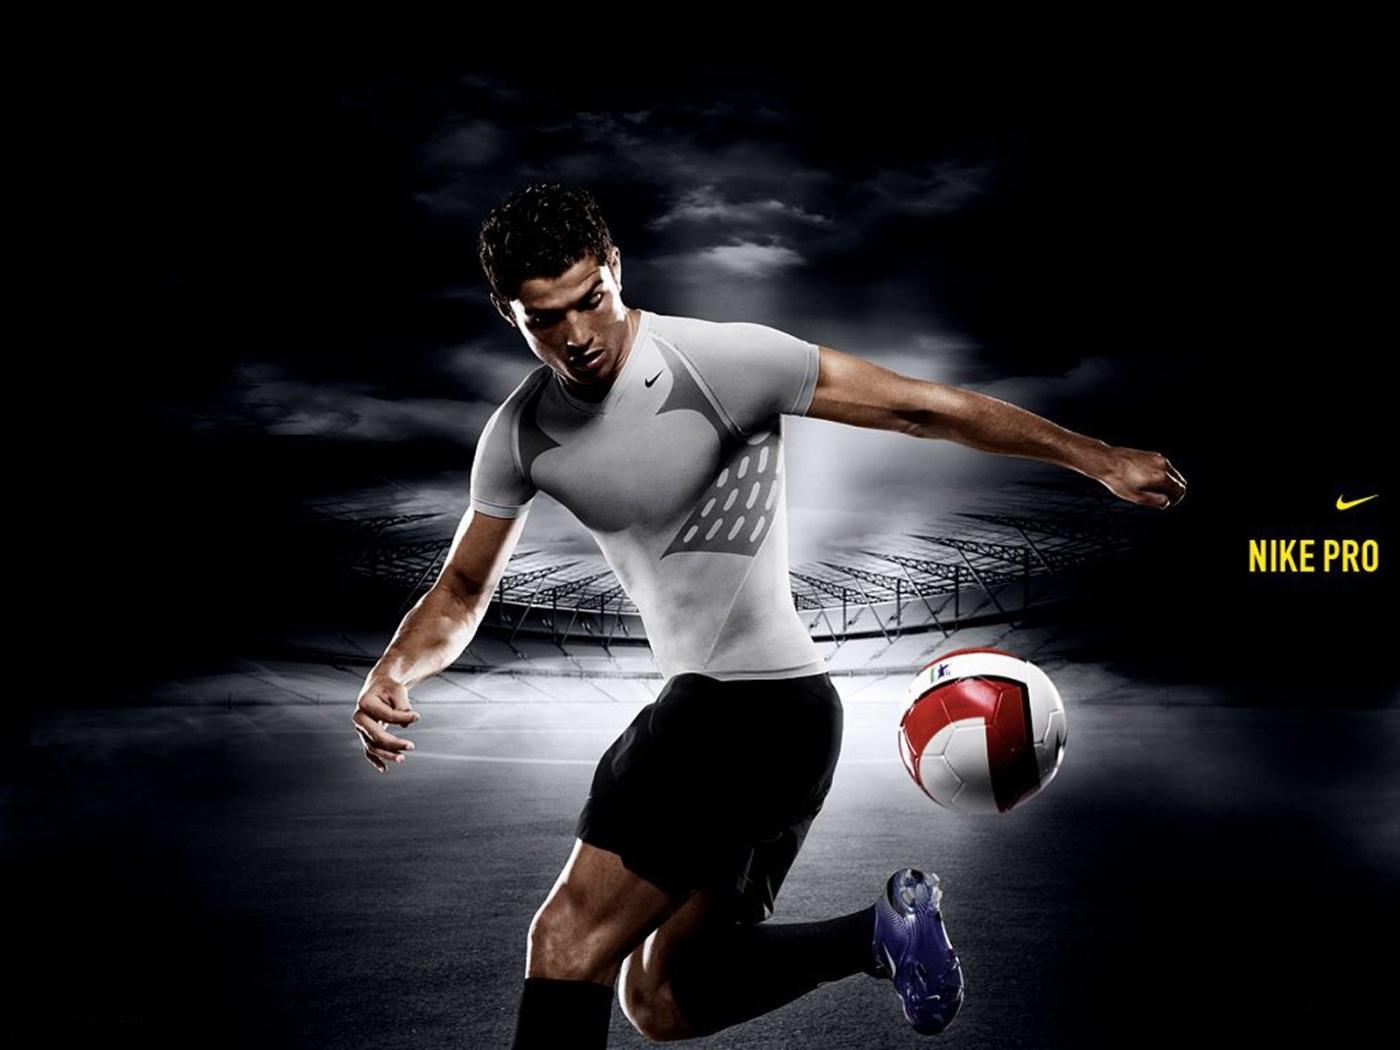 cfdd91d405 Papel de Parede Cristiano Ronaldo Propaganda Wallpaper para Download ...